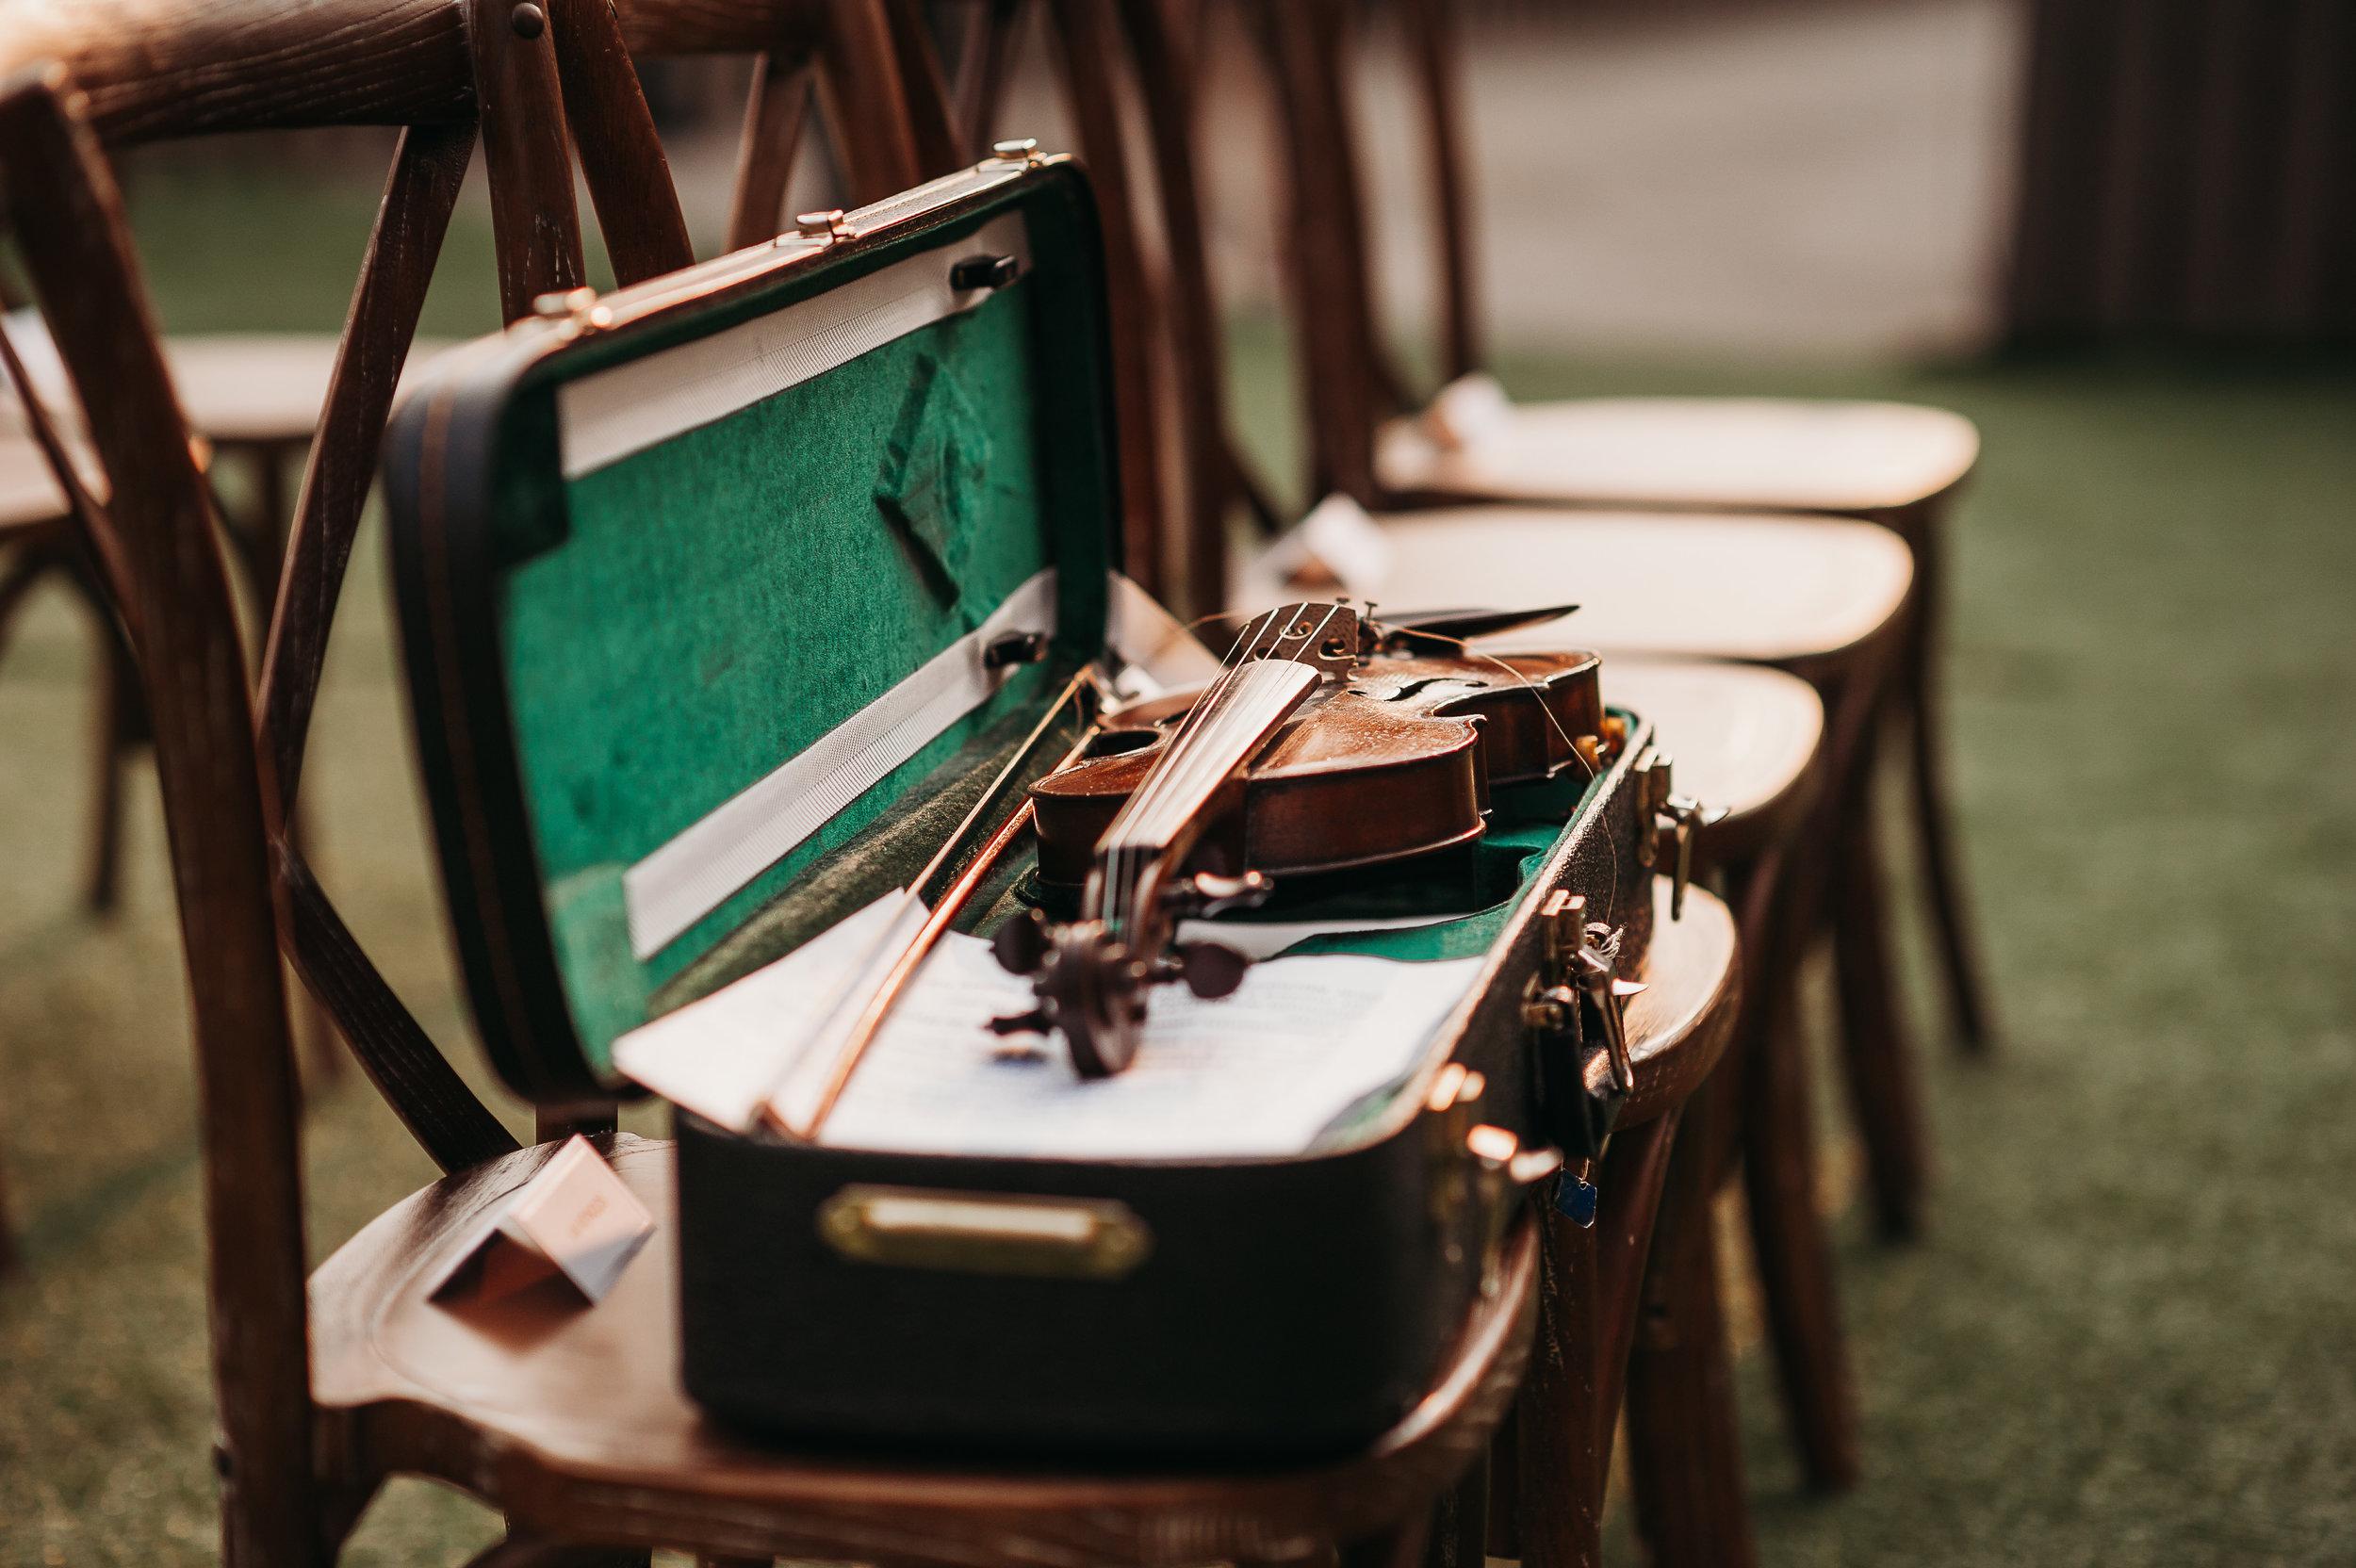 rustic-wedding-musician-toronto-rustic-boho-airship37-wedding-by-willow-birch-photo-toronto-documentary-wedding-photographers.jpg